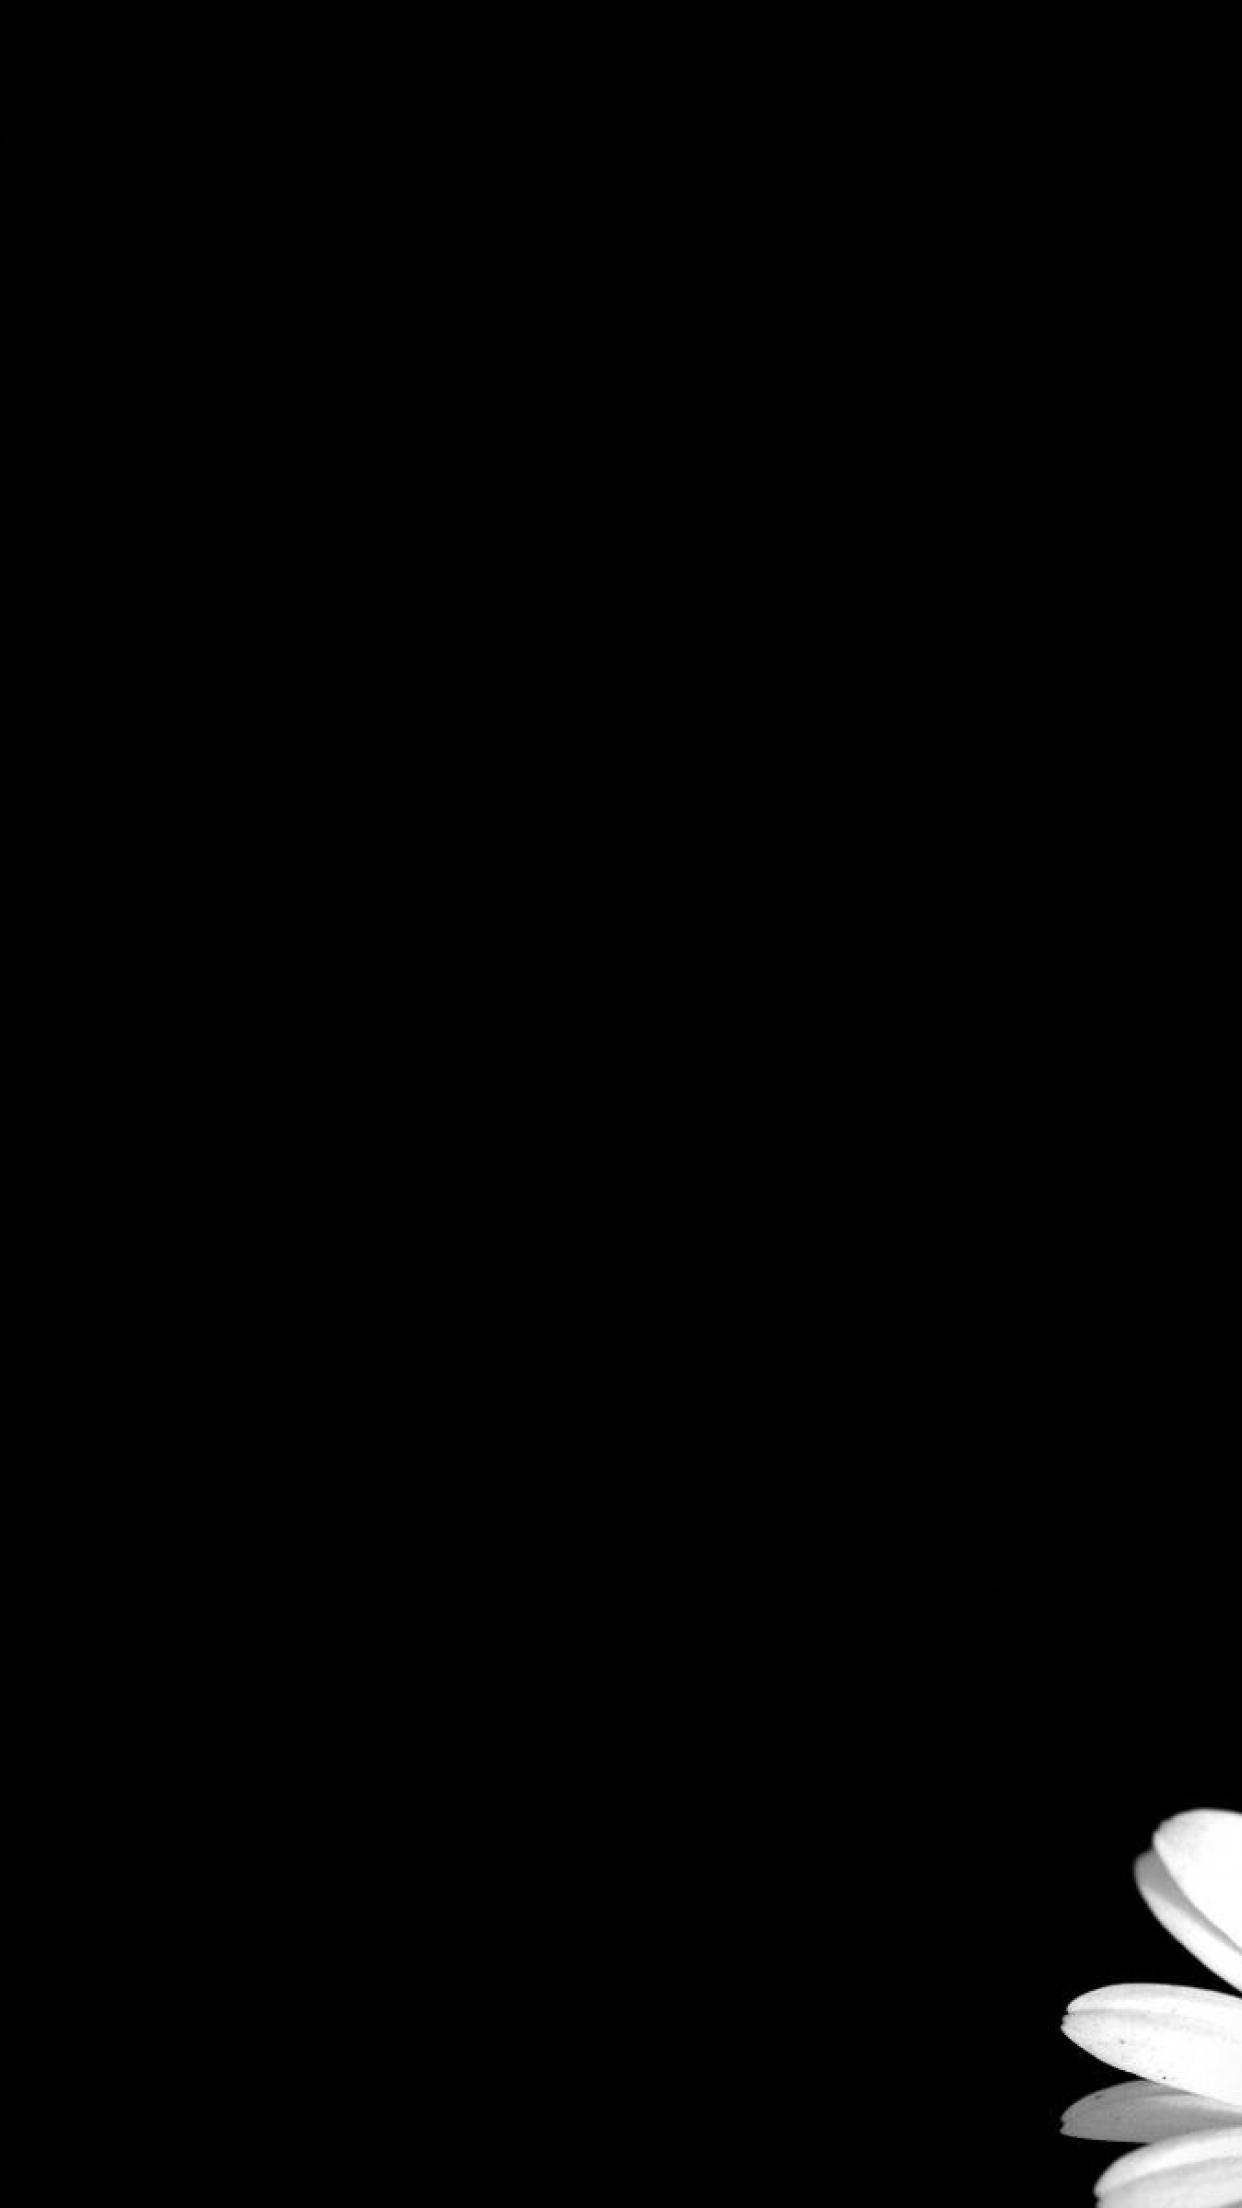 Free Download Black Background Hd Wallpapers Desktop Backgrounds 1242x2208 For Your Desktop Mobile Tablet Explore 78 Images With Black Background Images With Black Background Black Wallpaper Images Black Background Images